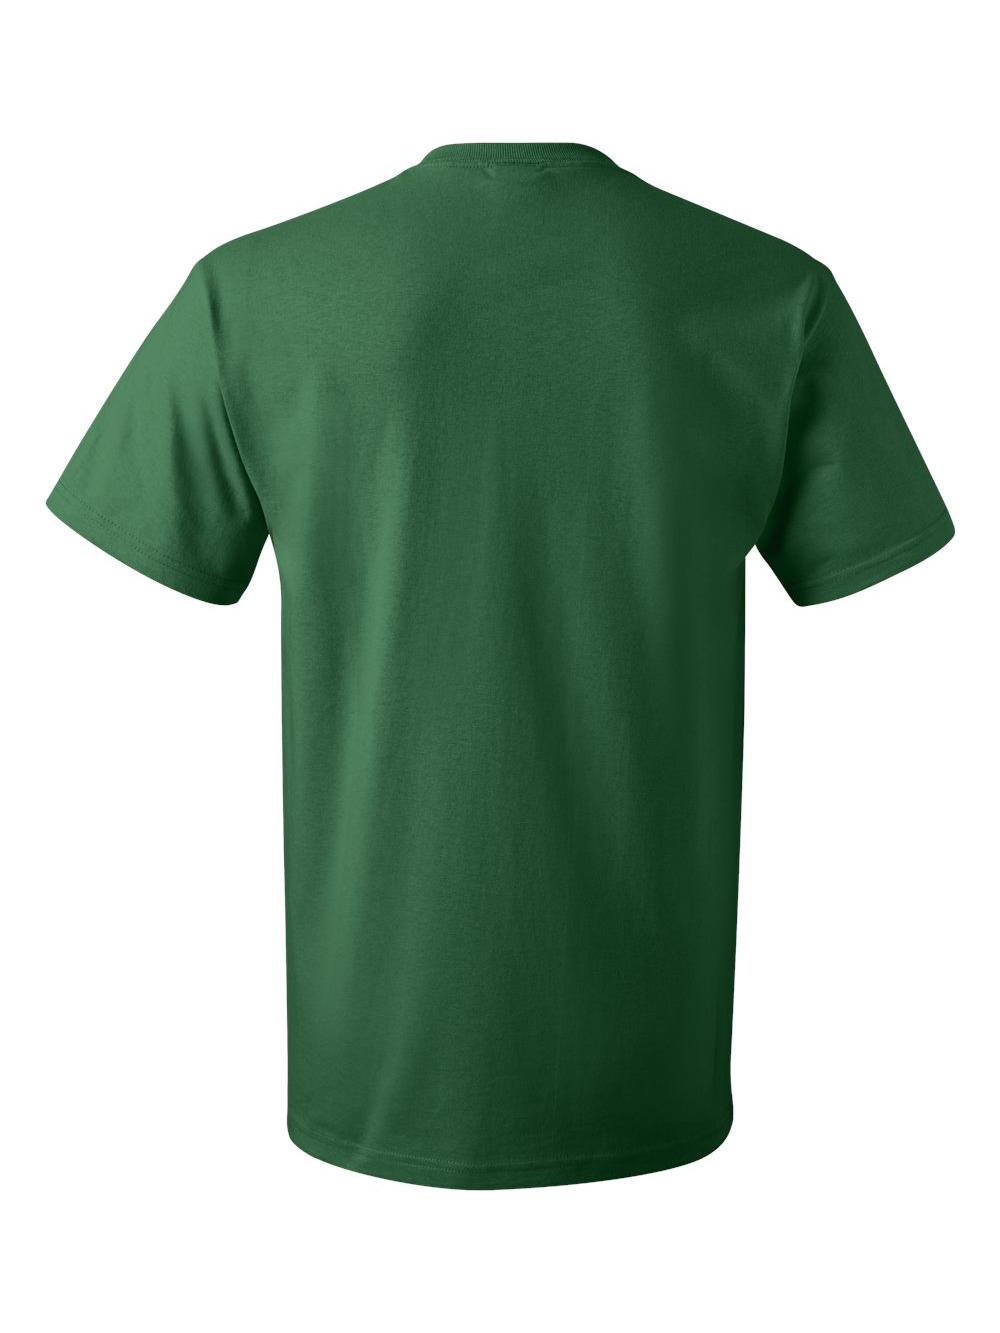 Fruit-of-the-Loom-HD-Cotton-Short-Sleeve-T-Shirt-3930R thumbnail 34